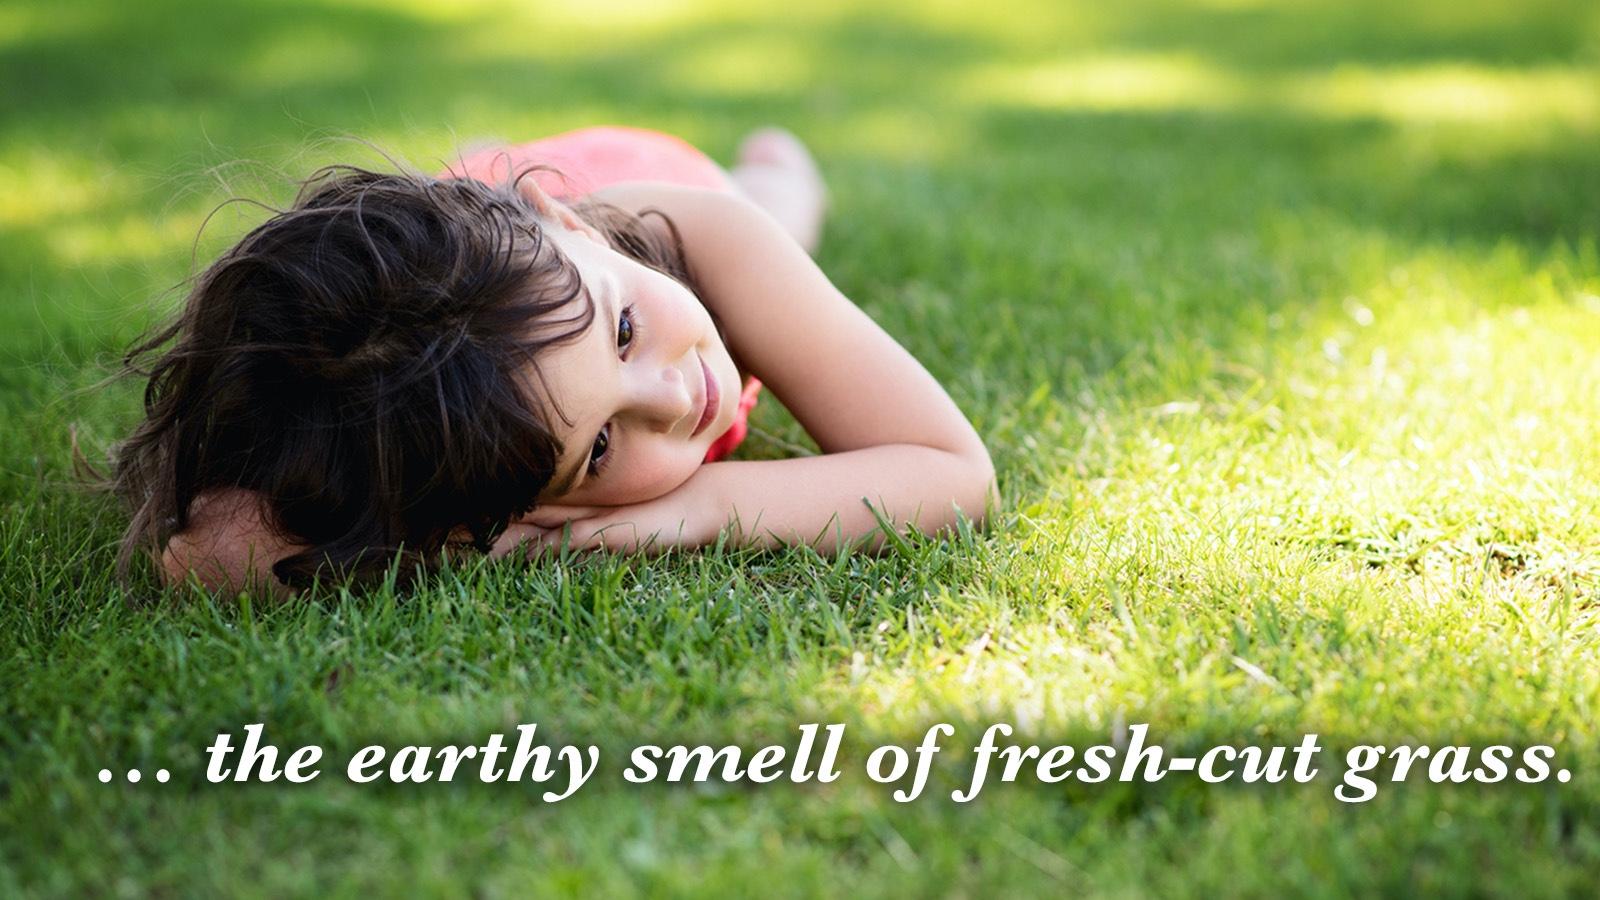 girl smelling fresh-cut grass